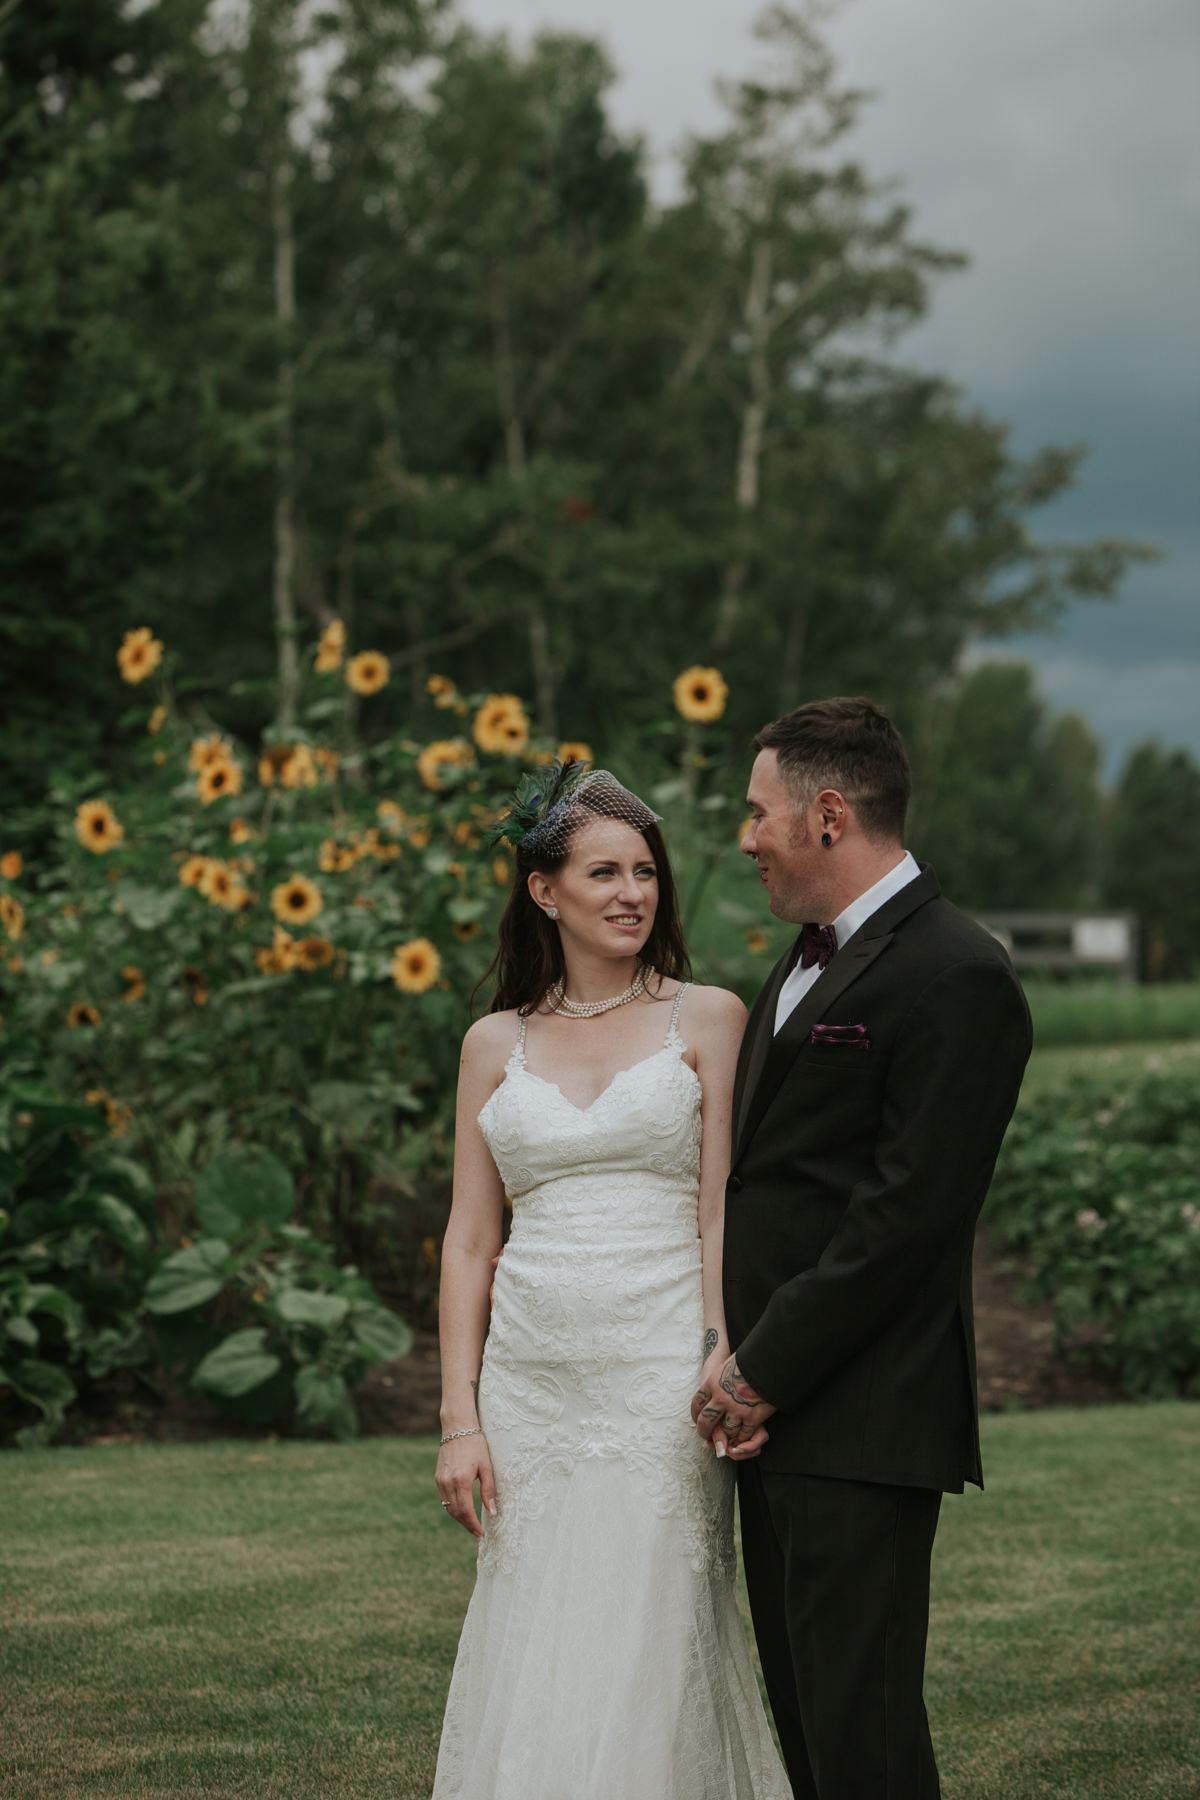 Vancouver Wedding Photographer Pam (54).jpg